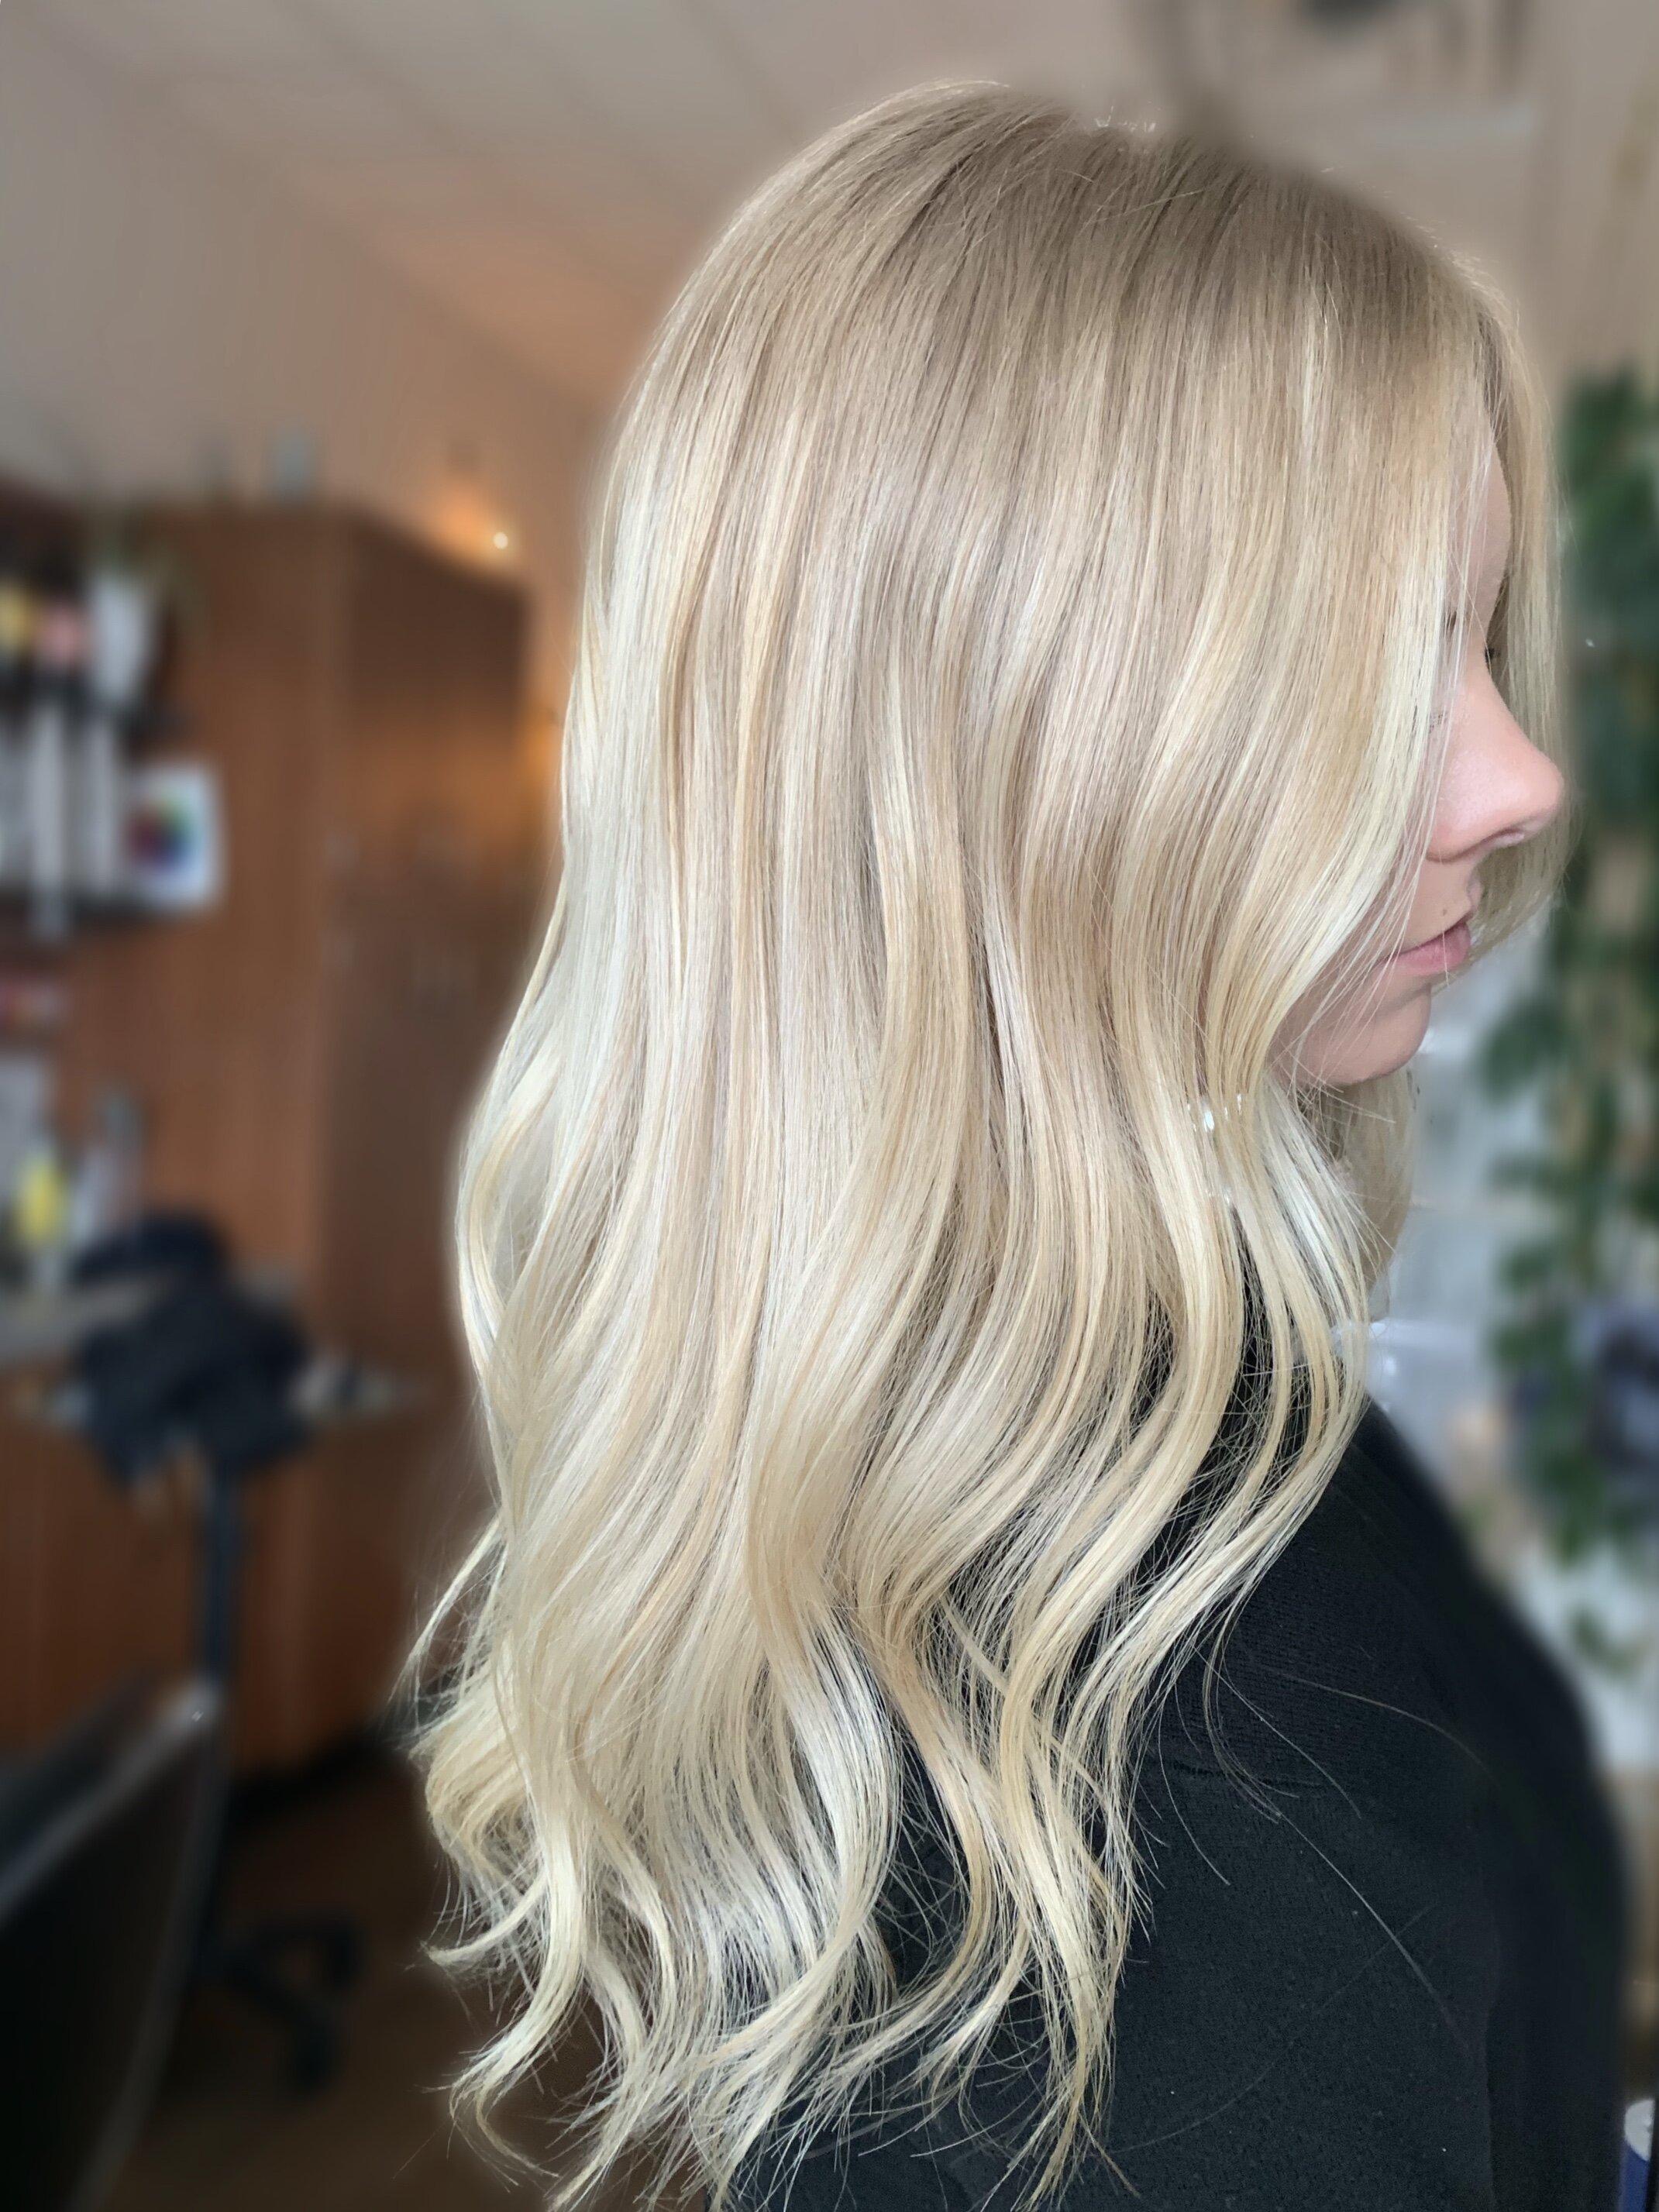 Hair by Serena